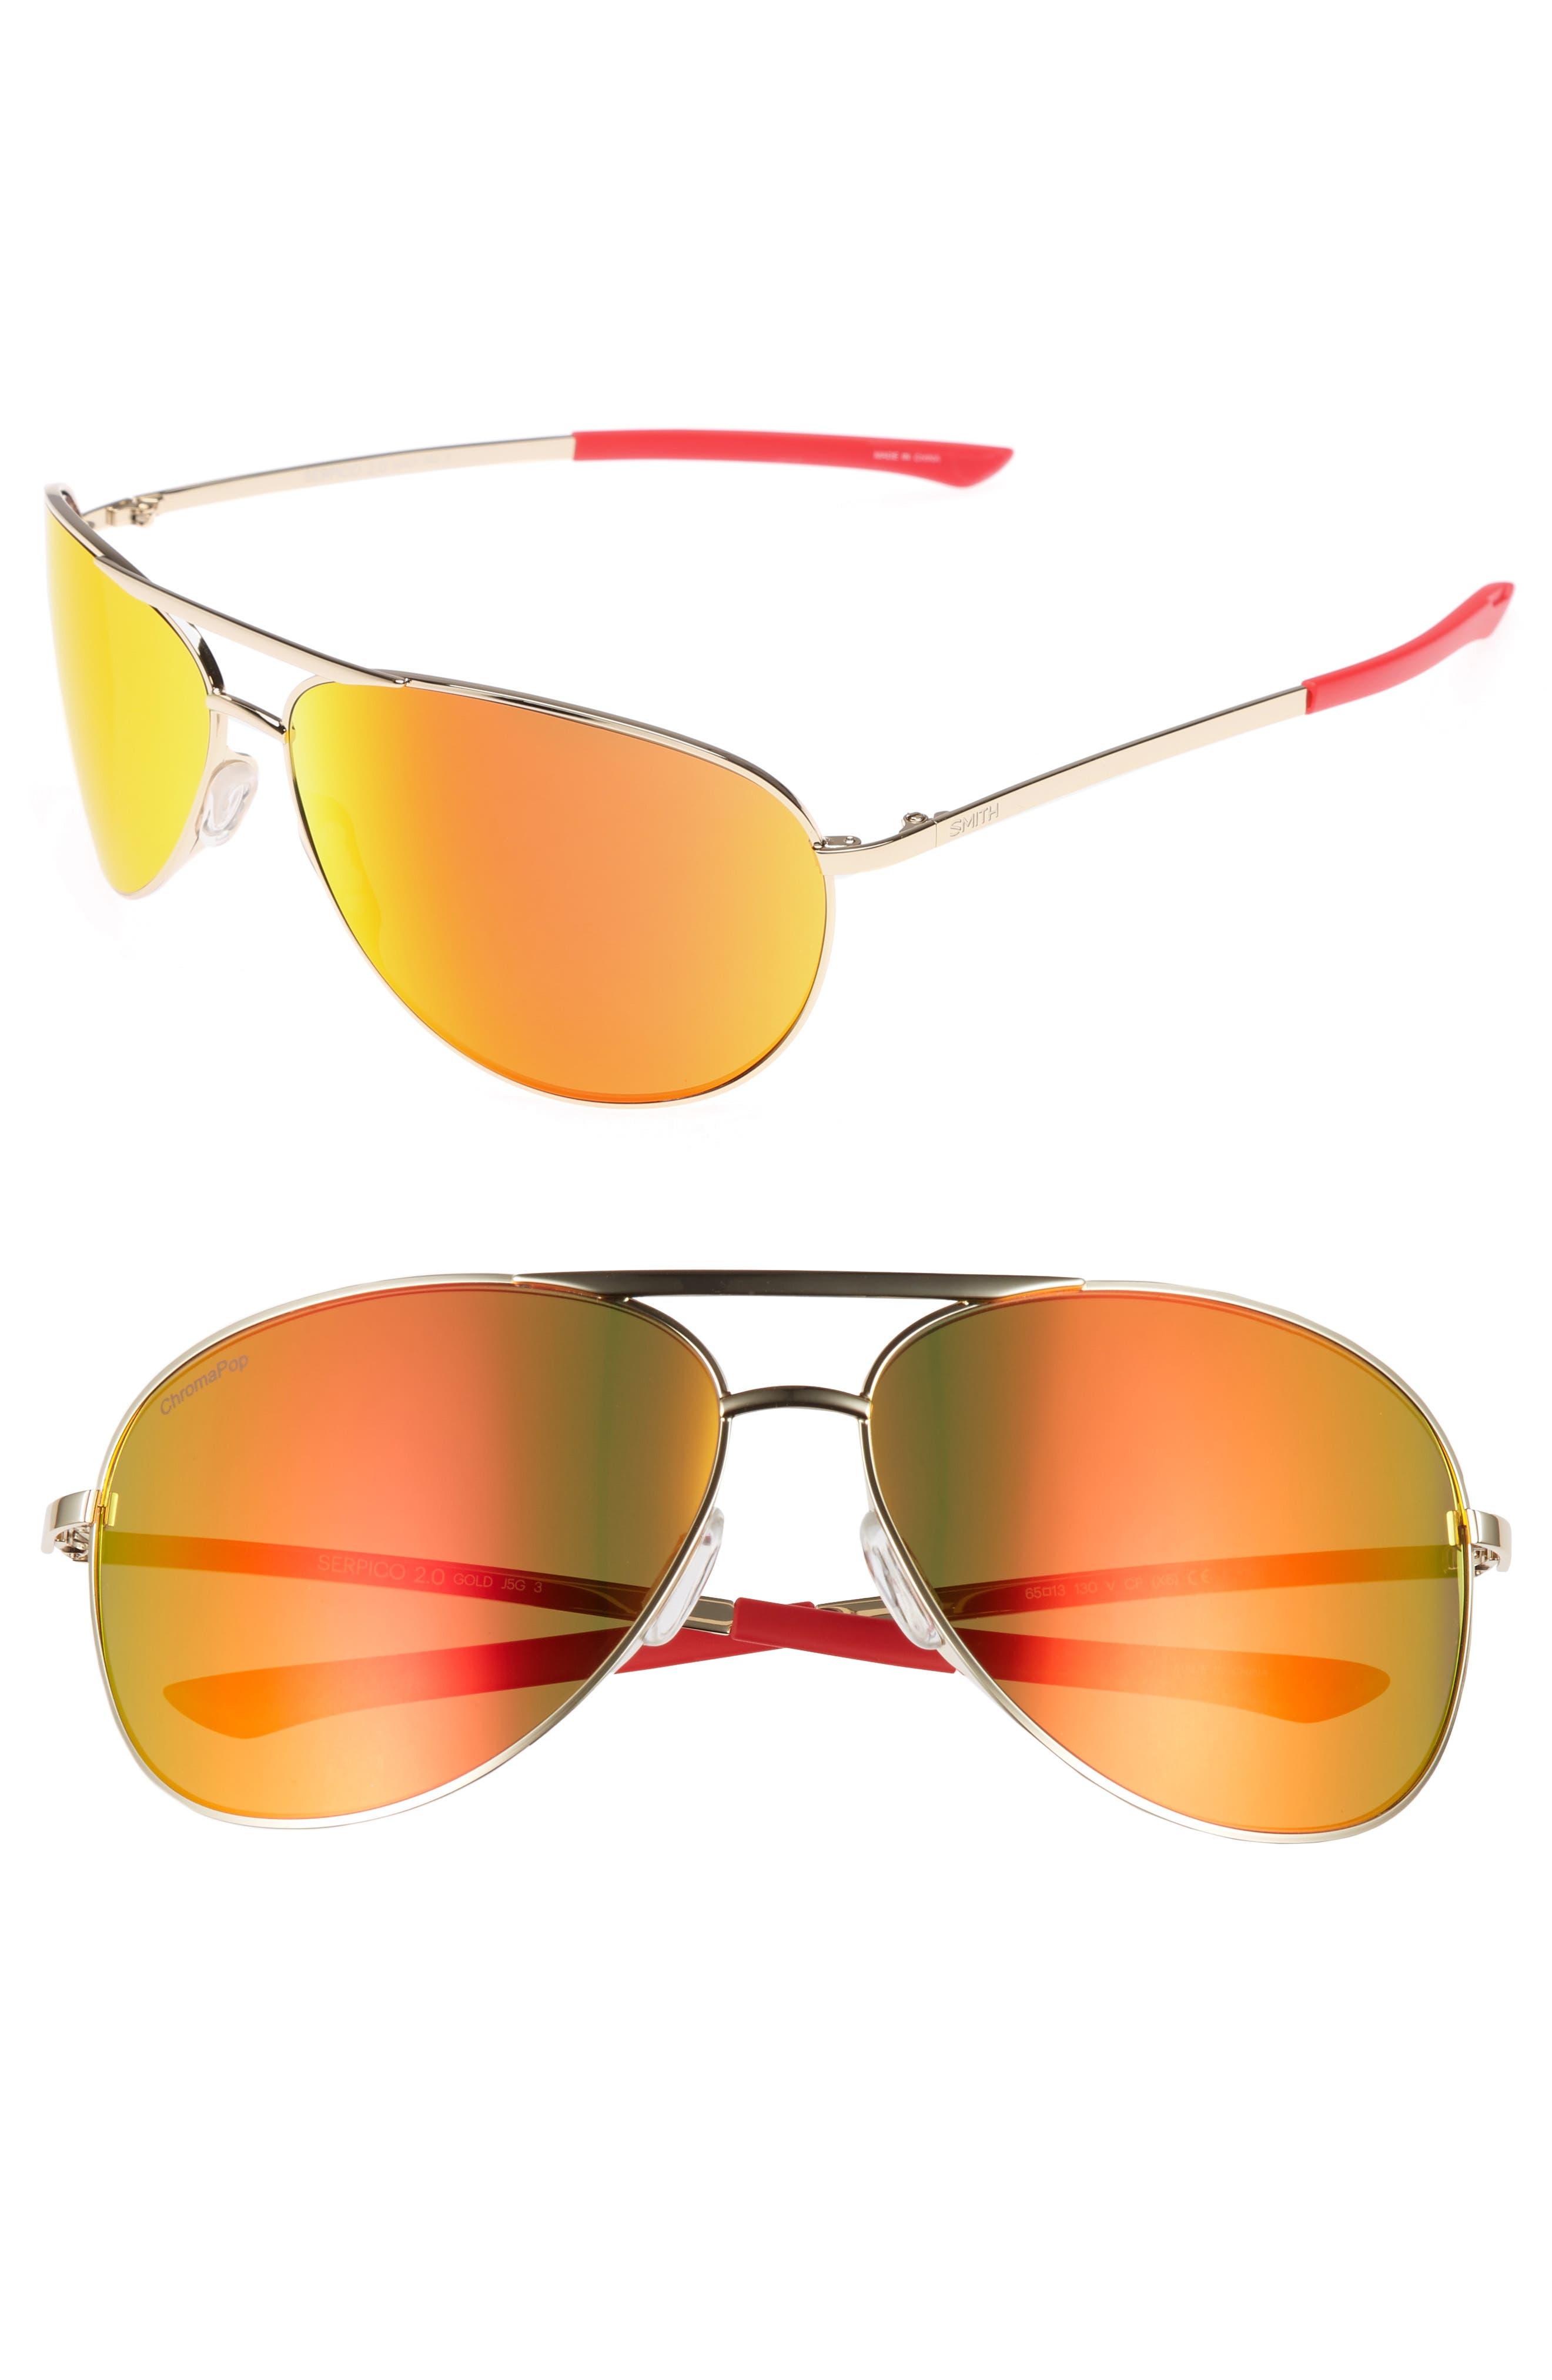 Serpico 2 65mm Mirrored ChromaPop<sup>™</sup> Polarized Aviator Sunglasses,                             Main thumbnail 1, color,                             710